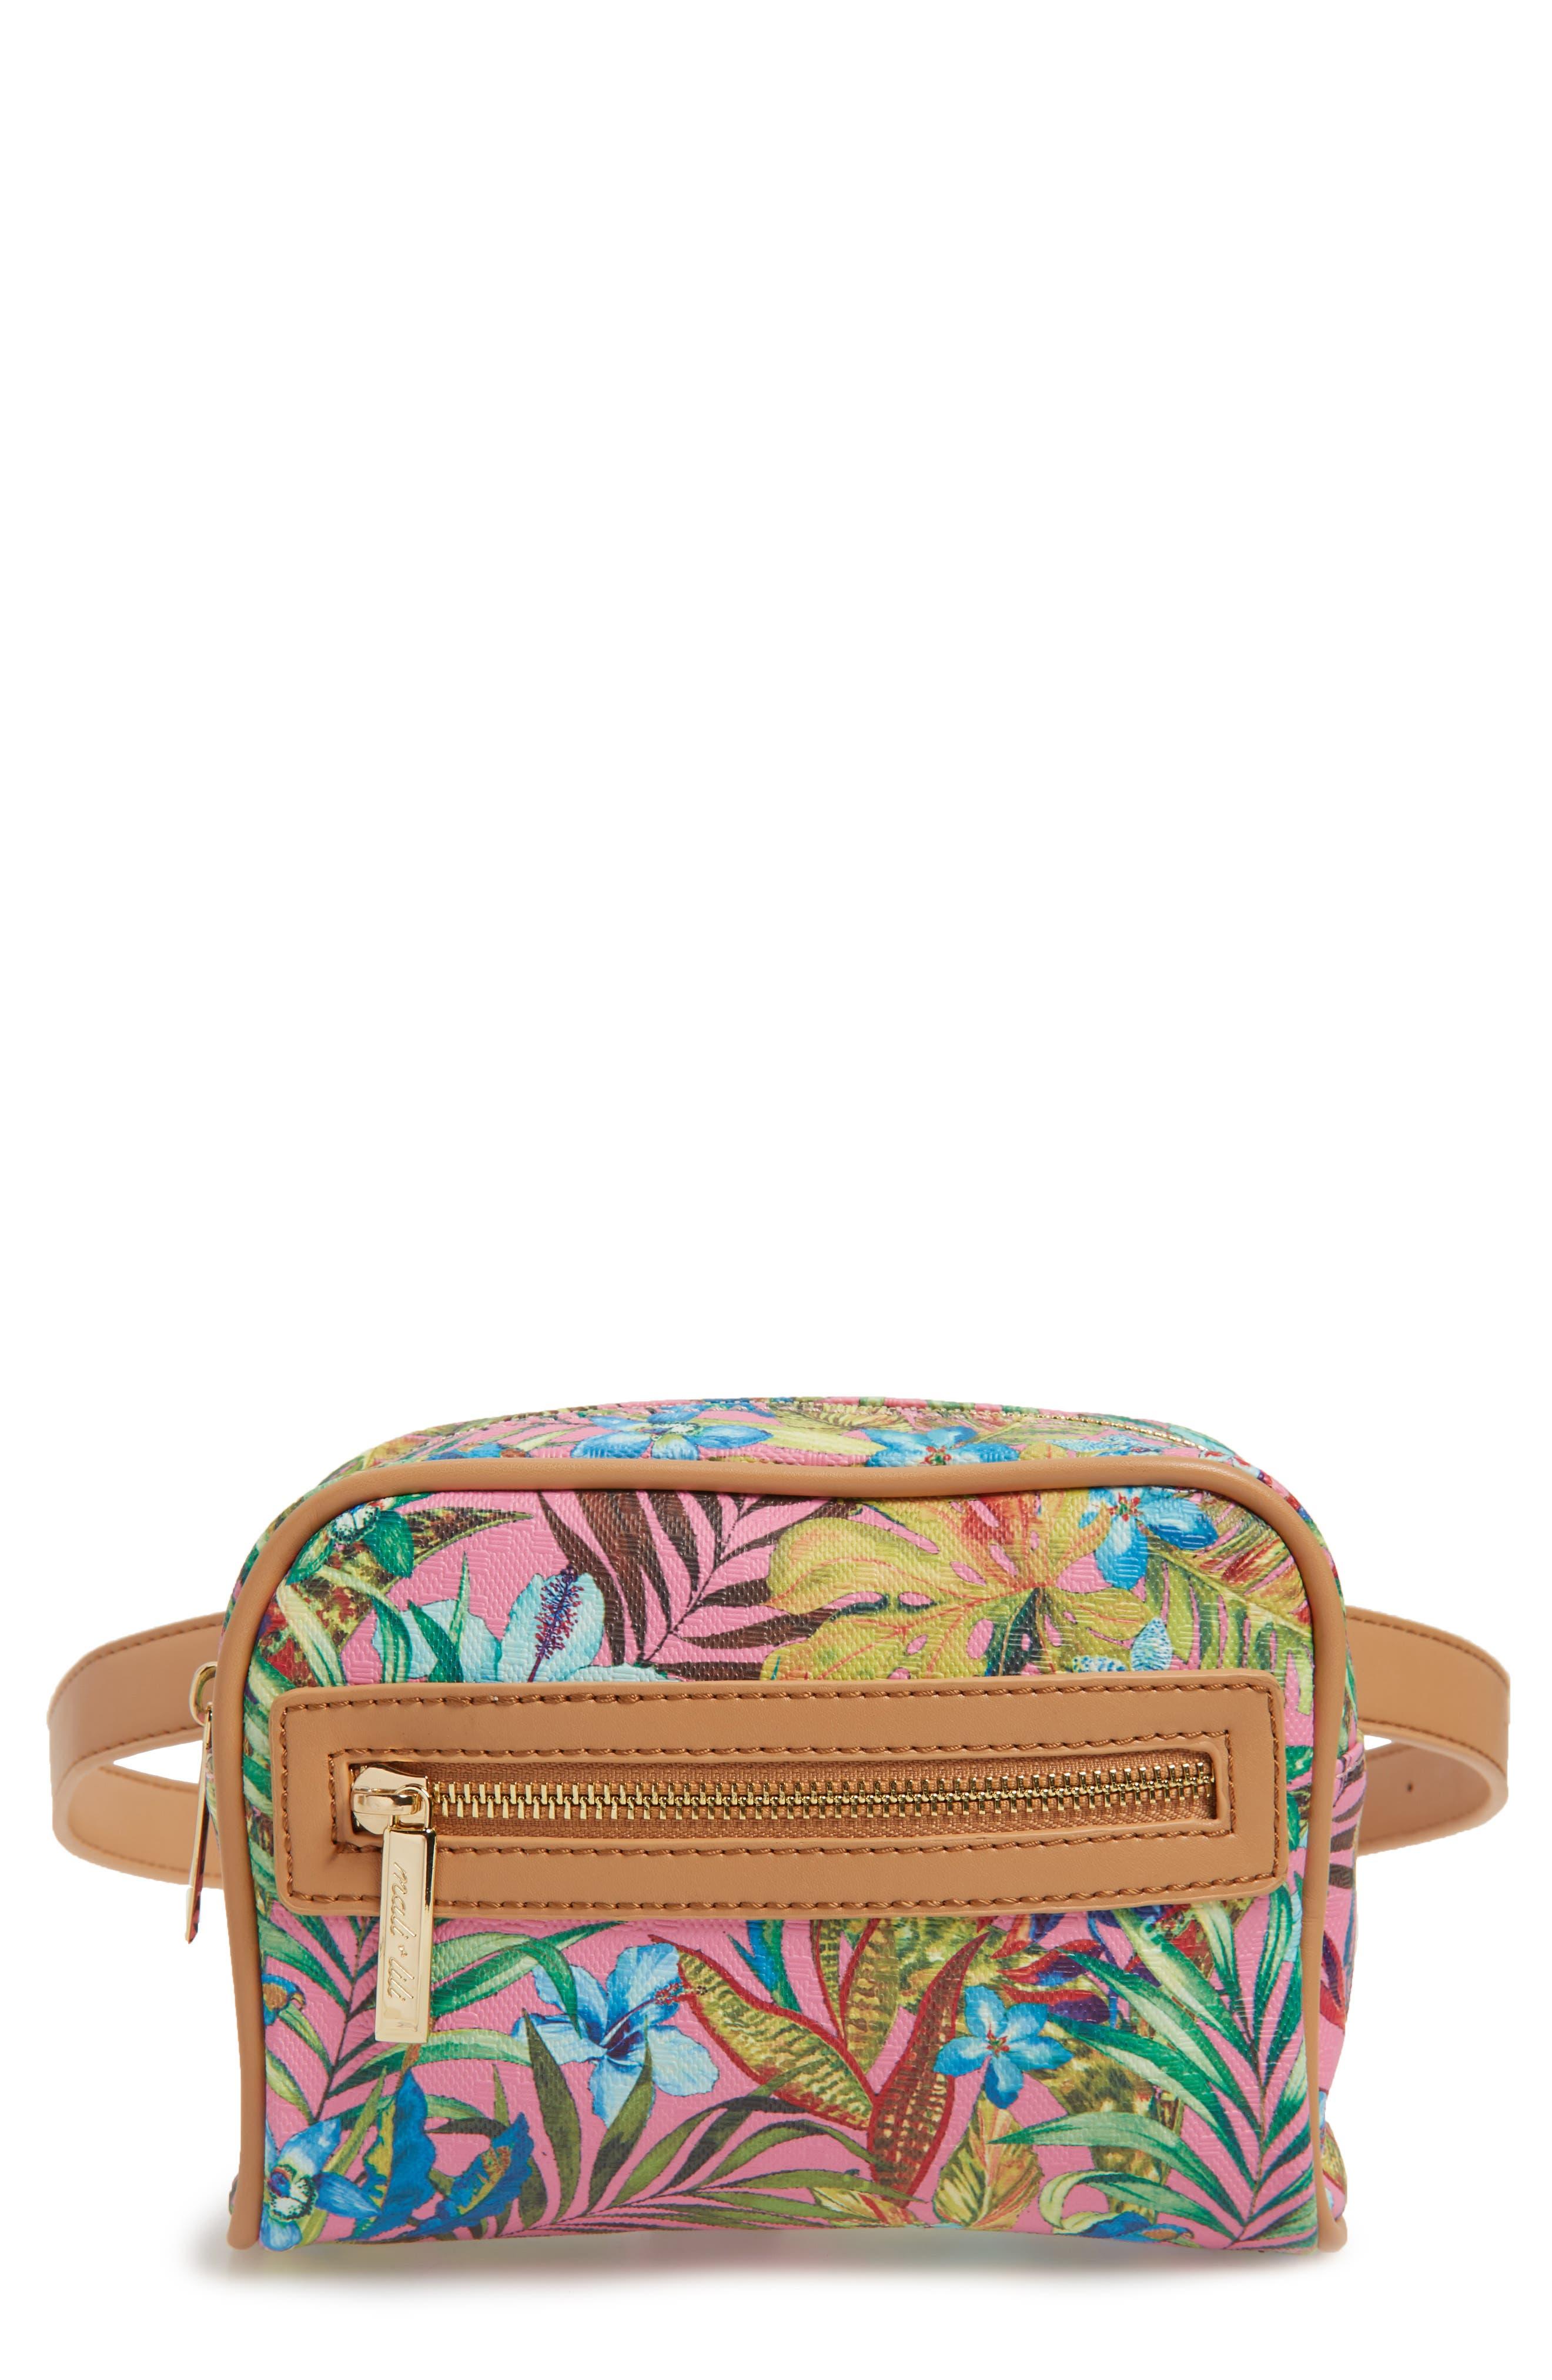 Mali + Lili Lacey Floral Convertible Vegan Leather Belt Bag